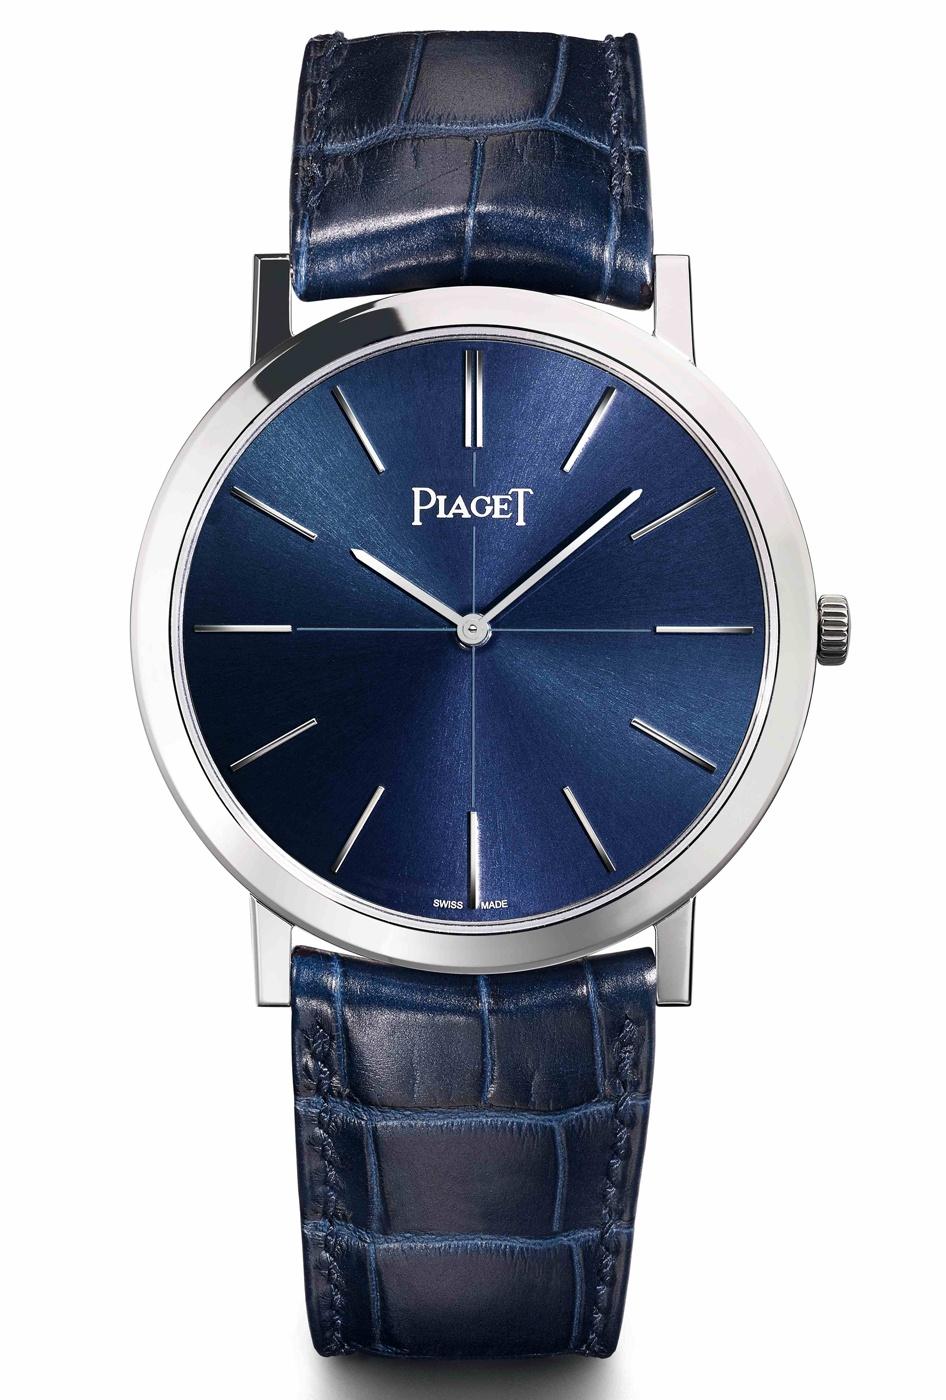 Piaget Altiplano系列 传世腕表典范 欢庆诞生60周年